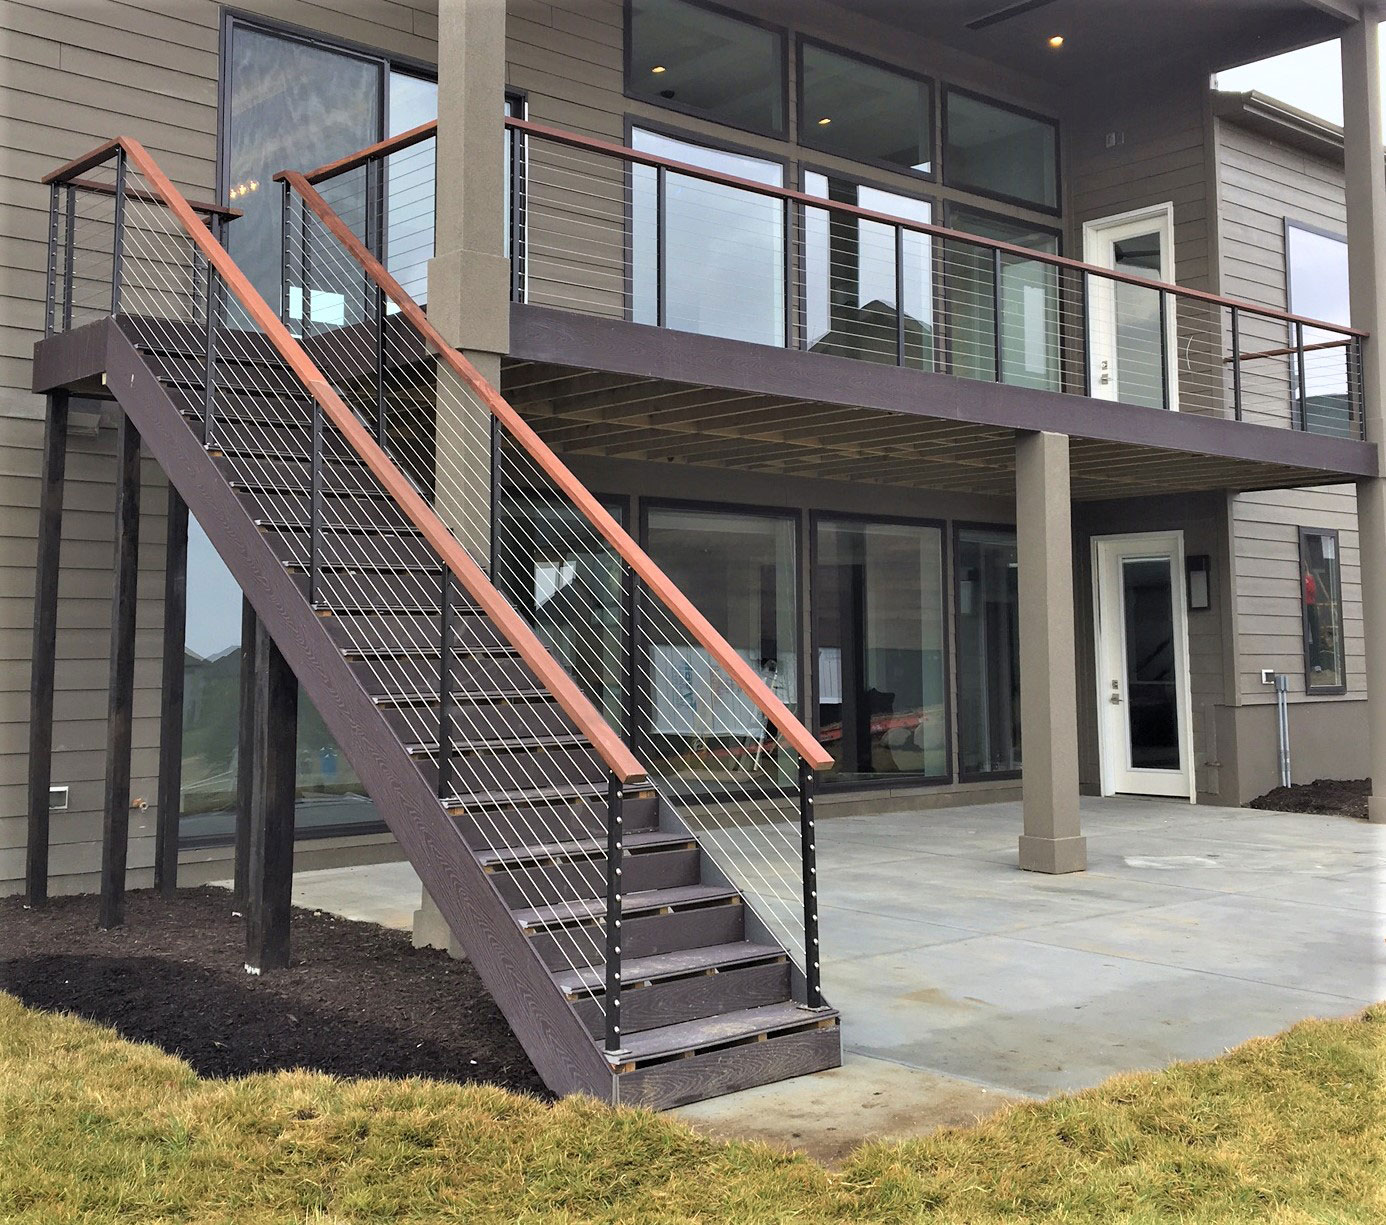 Modern Deck Railings | Stainless Steel Cable Deck Railings